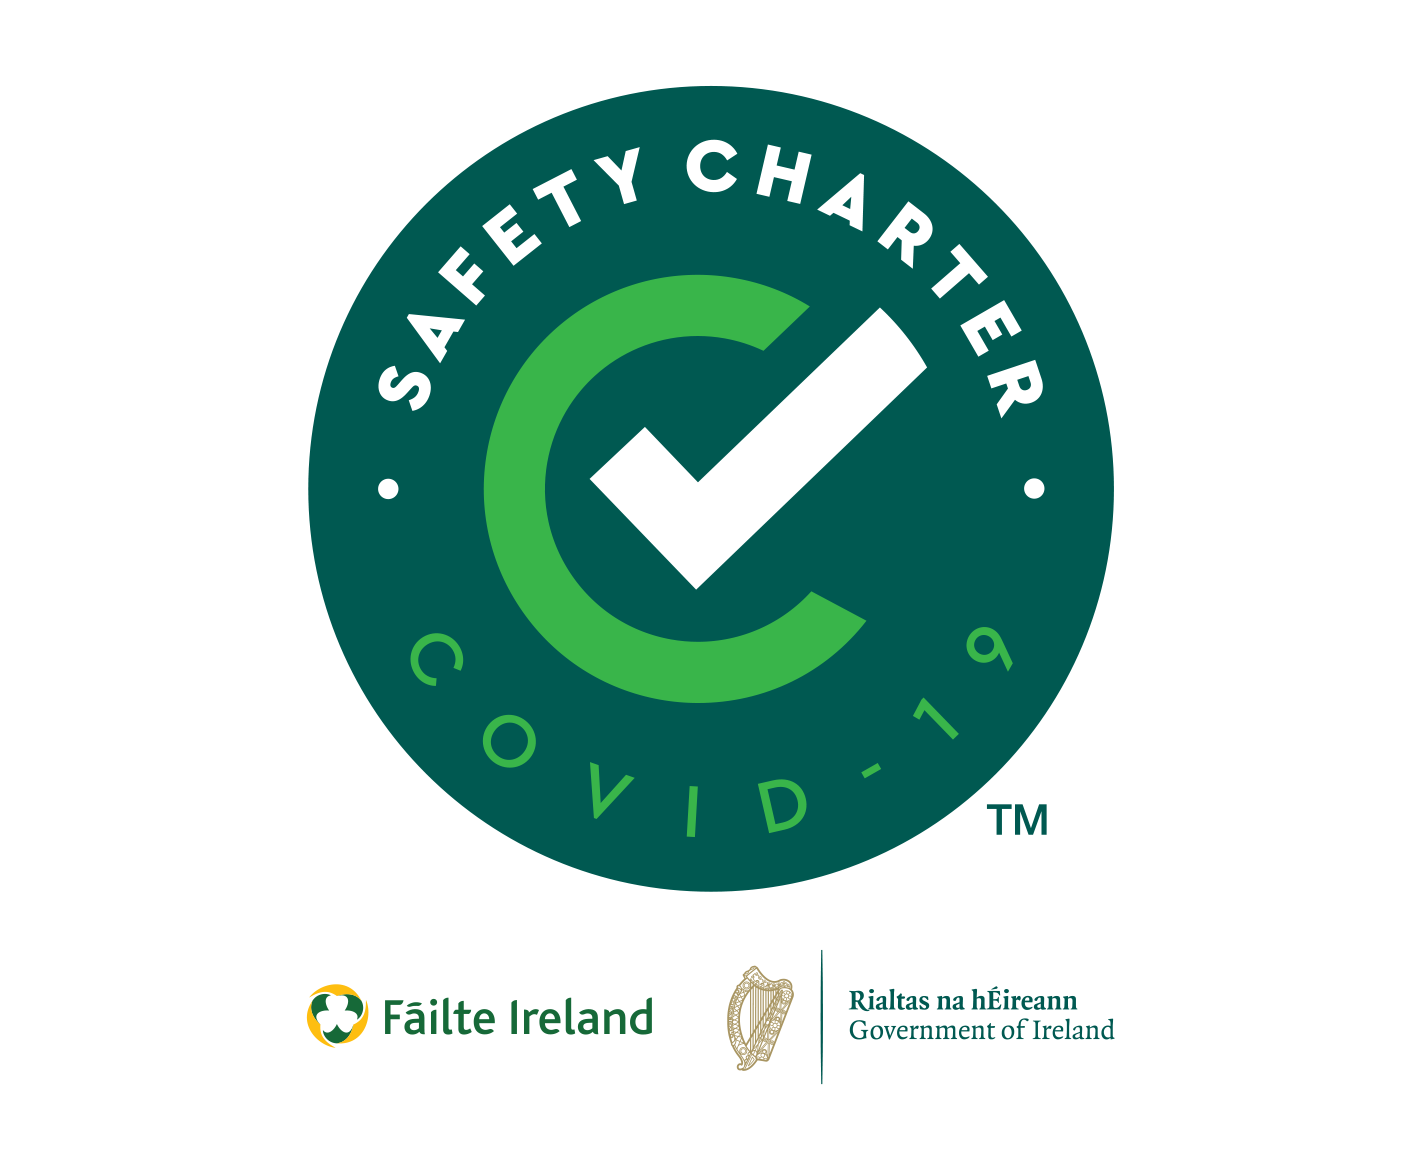 Safety Charter ATC Accreditation